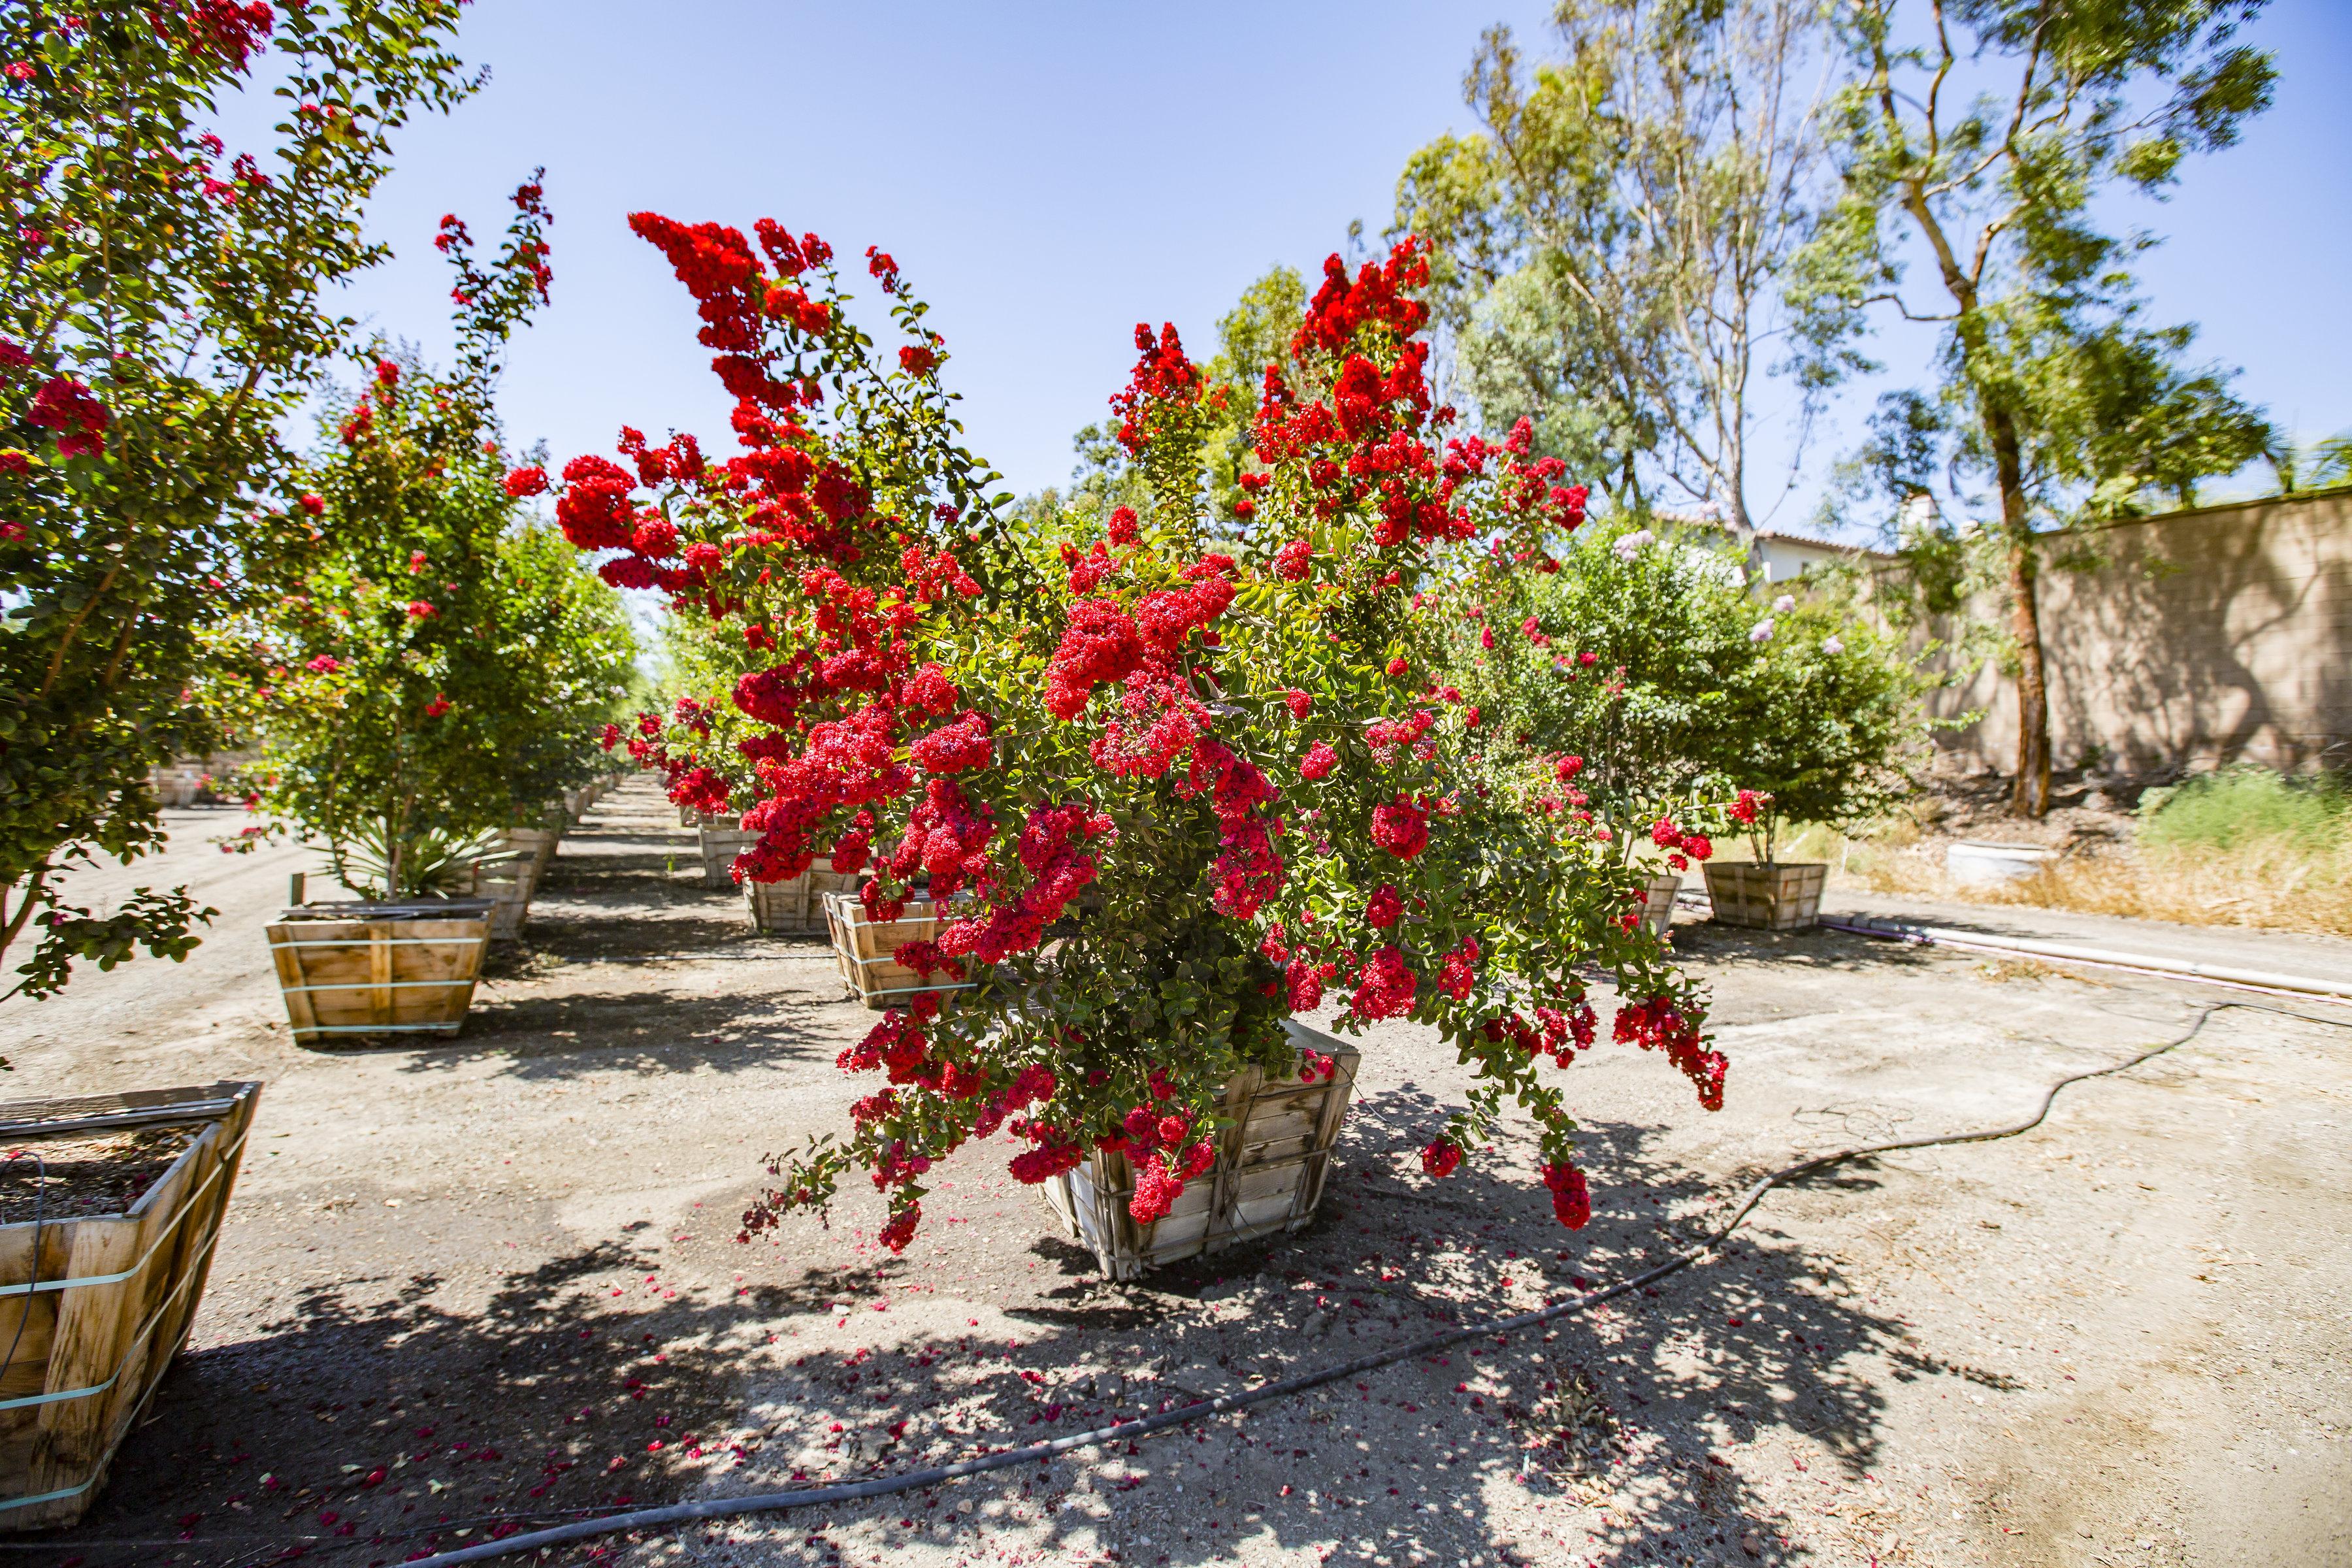 Crape_myrtle_tree_red.jpg